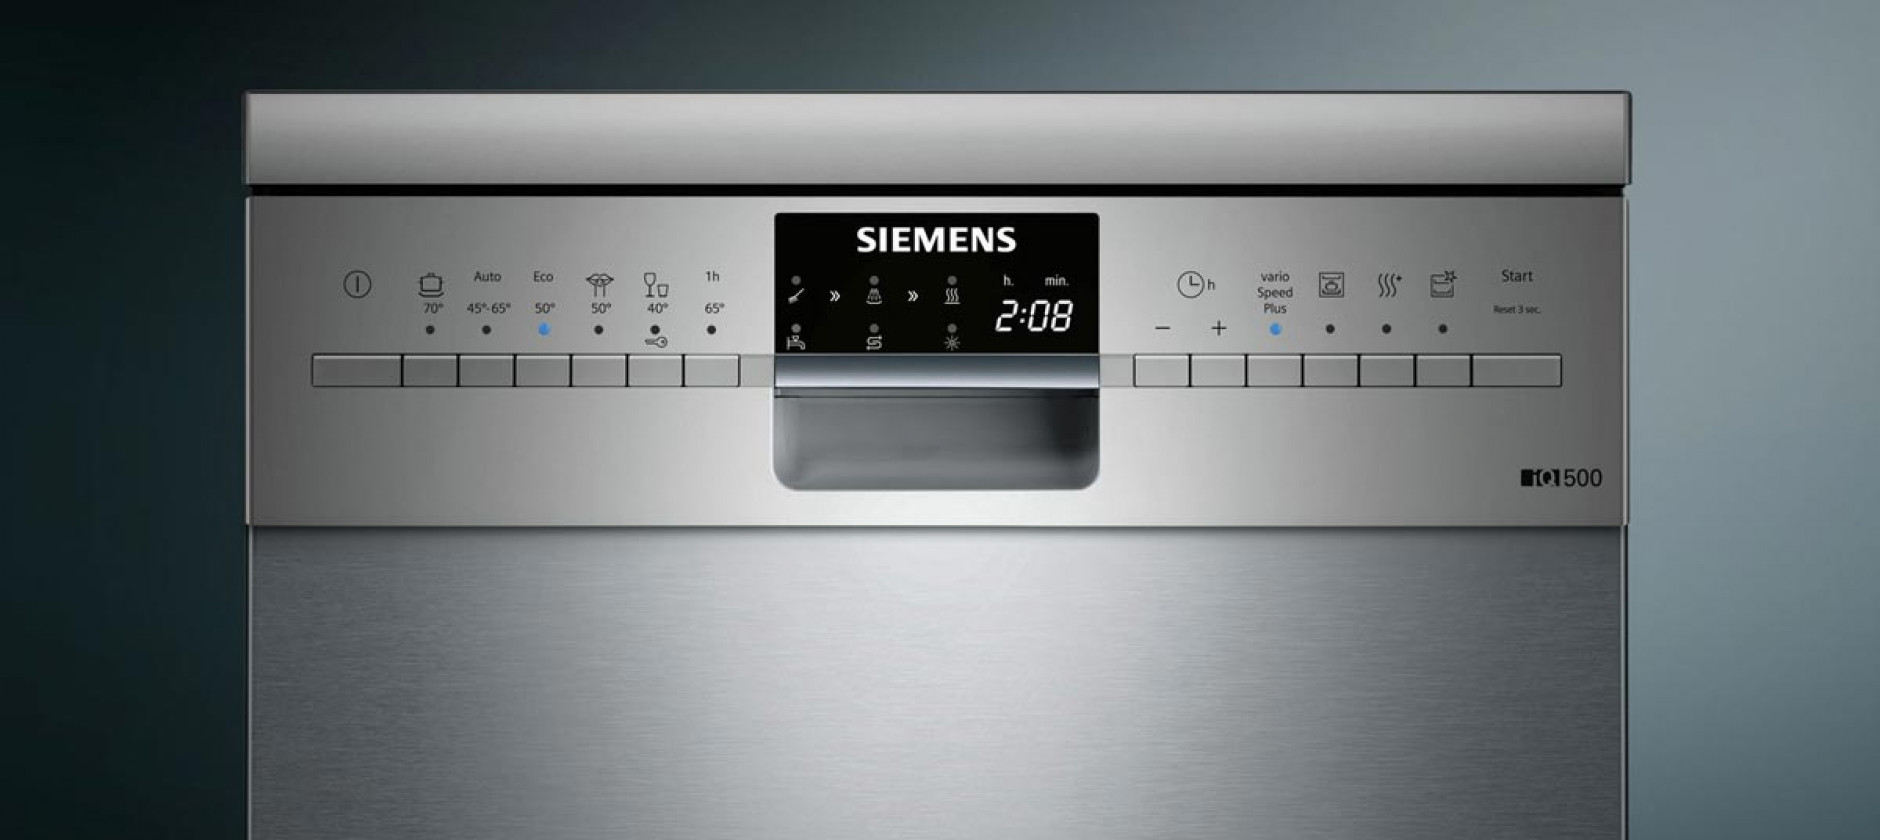 Lavastoviglie Siemens MediaWorld